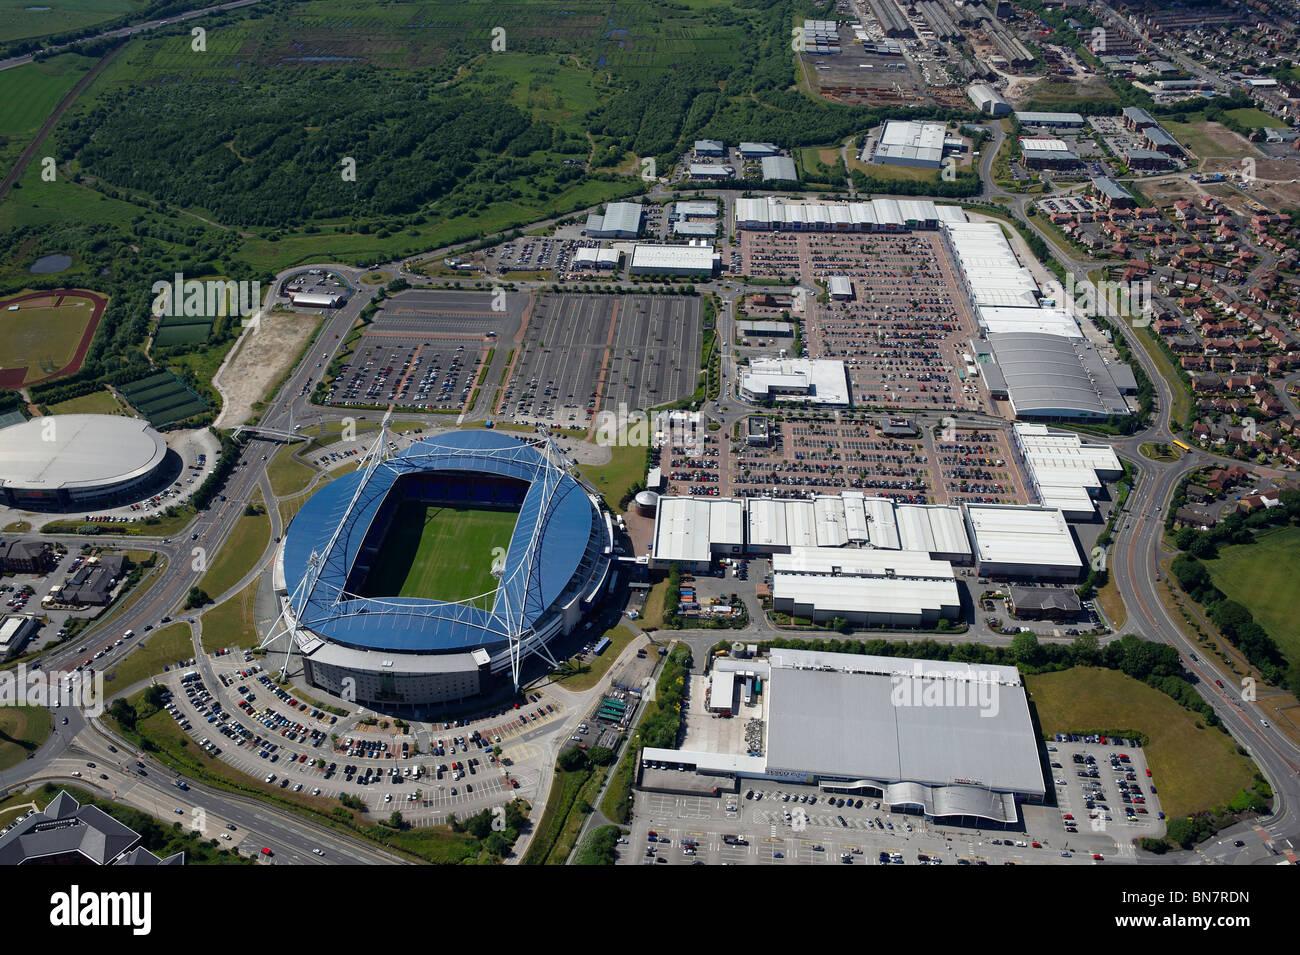 Reebock Stadium e Retail Park. Bolton, Lancashire, Nord Ovest Inghilterra Immagini Stock